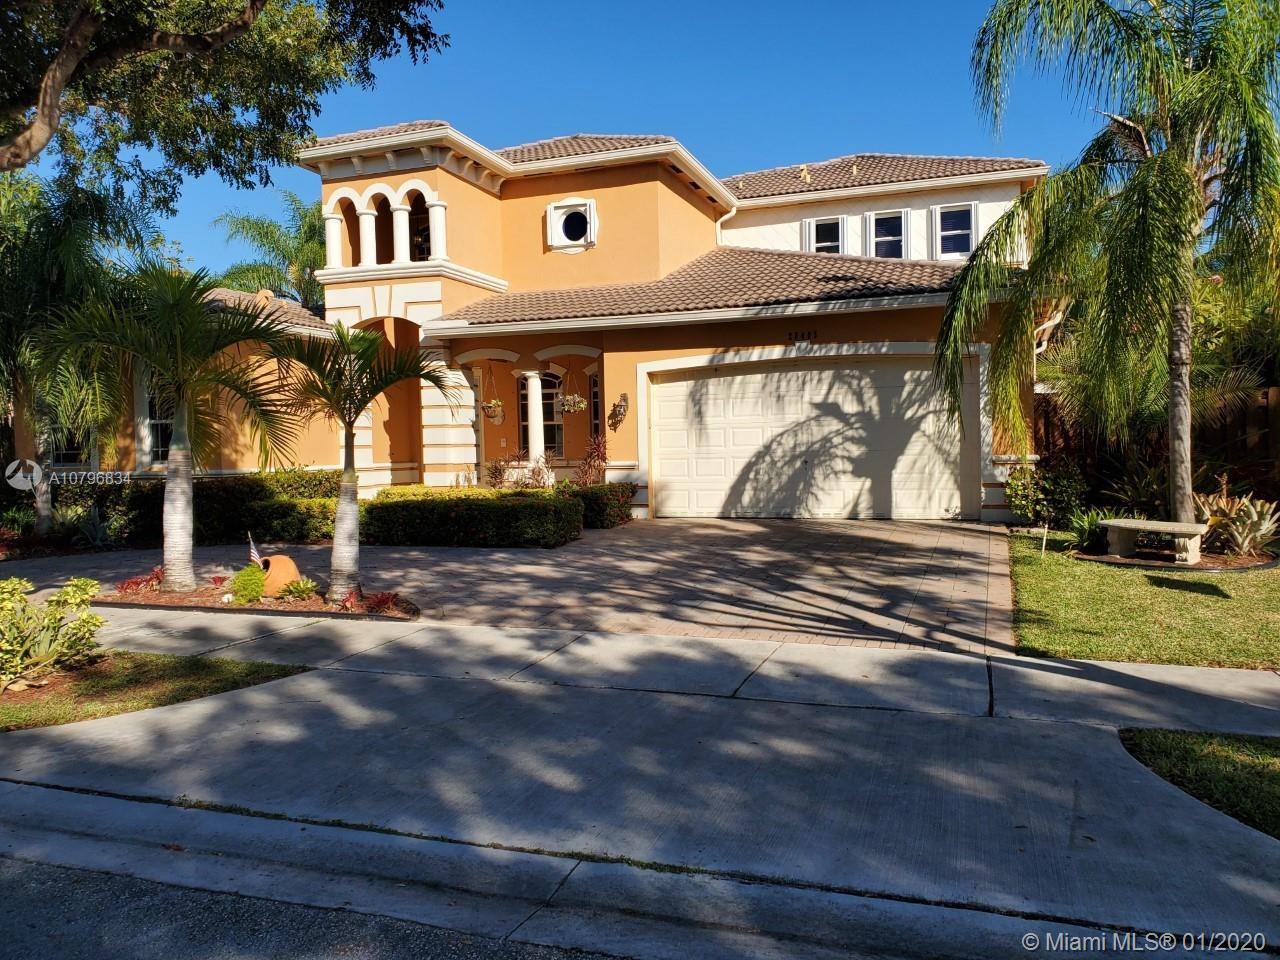 20405 SW 89th Ave, Cutler Bay, FL 33189